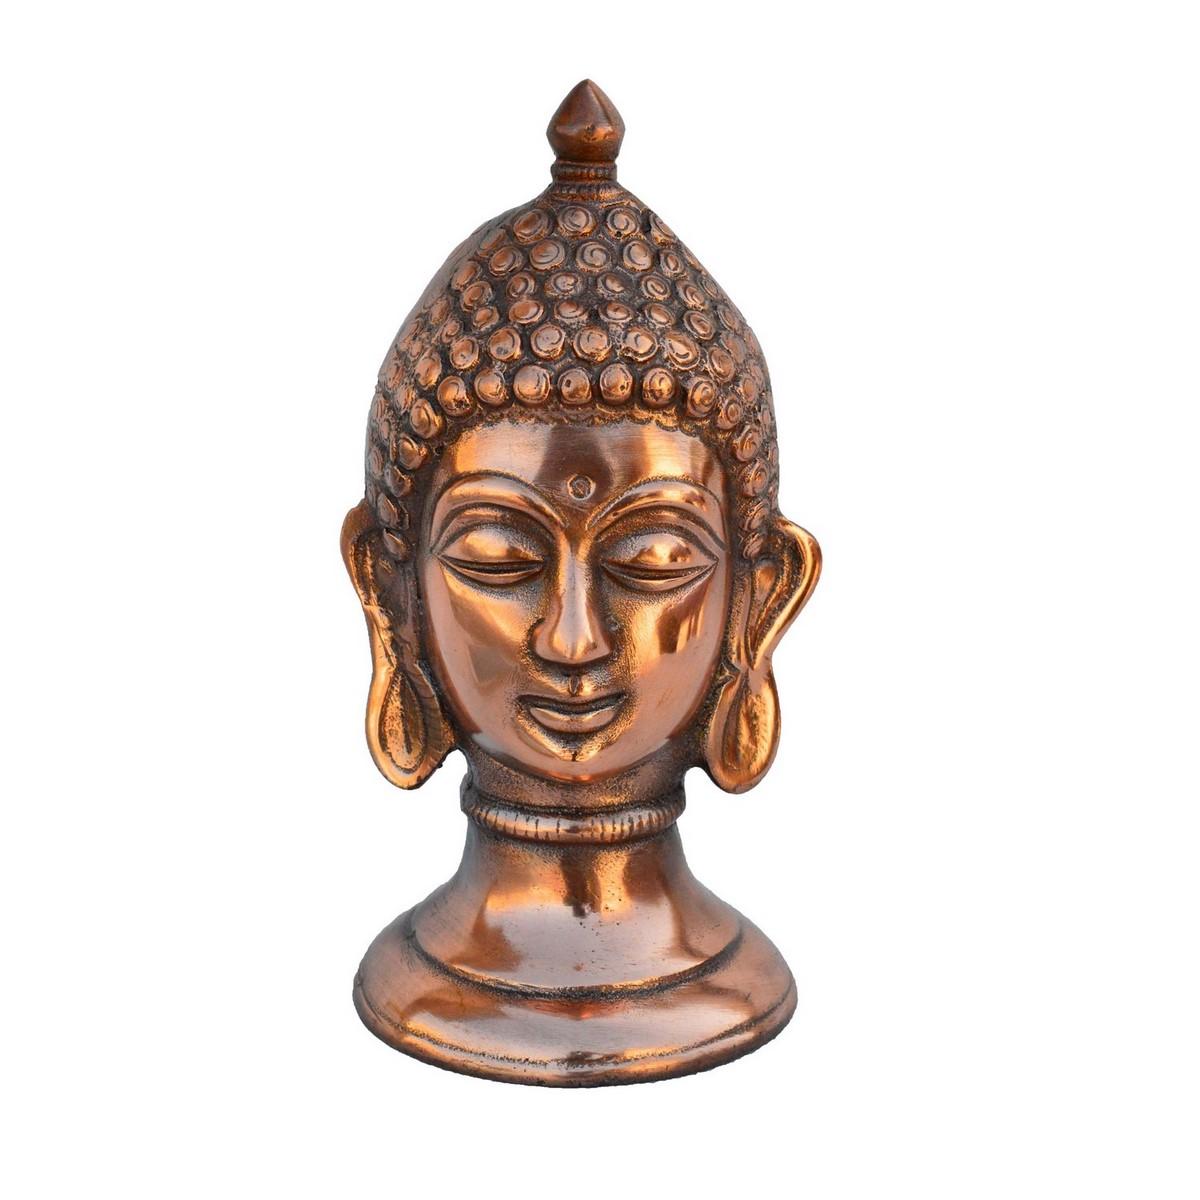 Metal Lord Buddha Showpiece Indian Home Decor